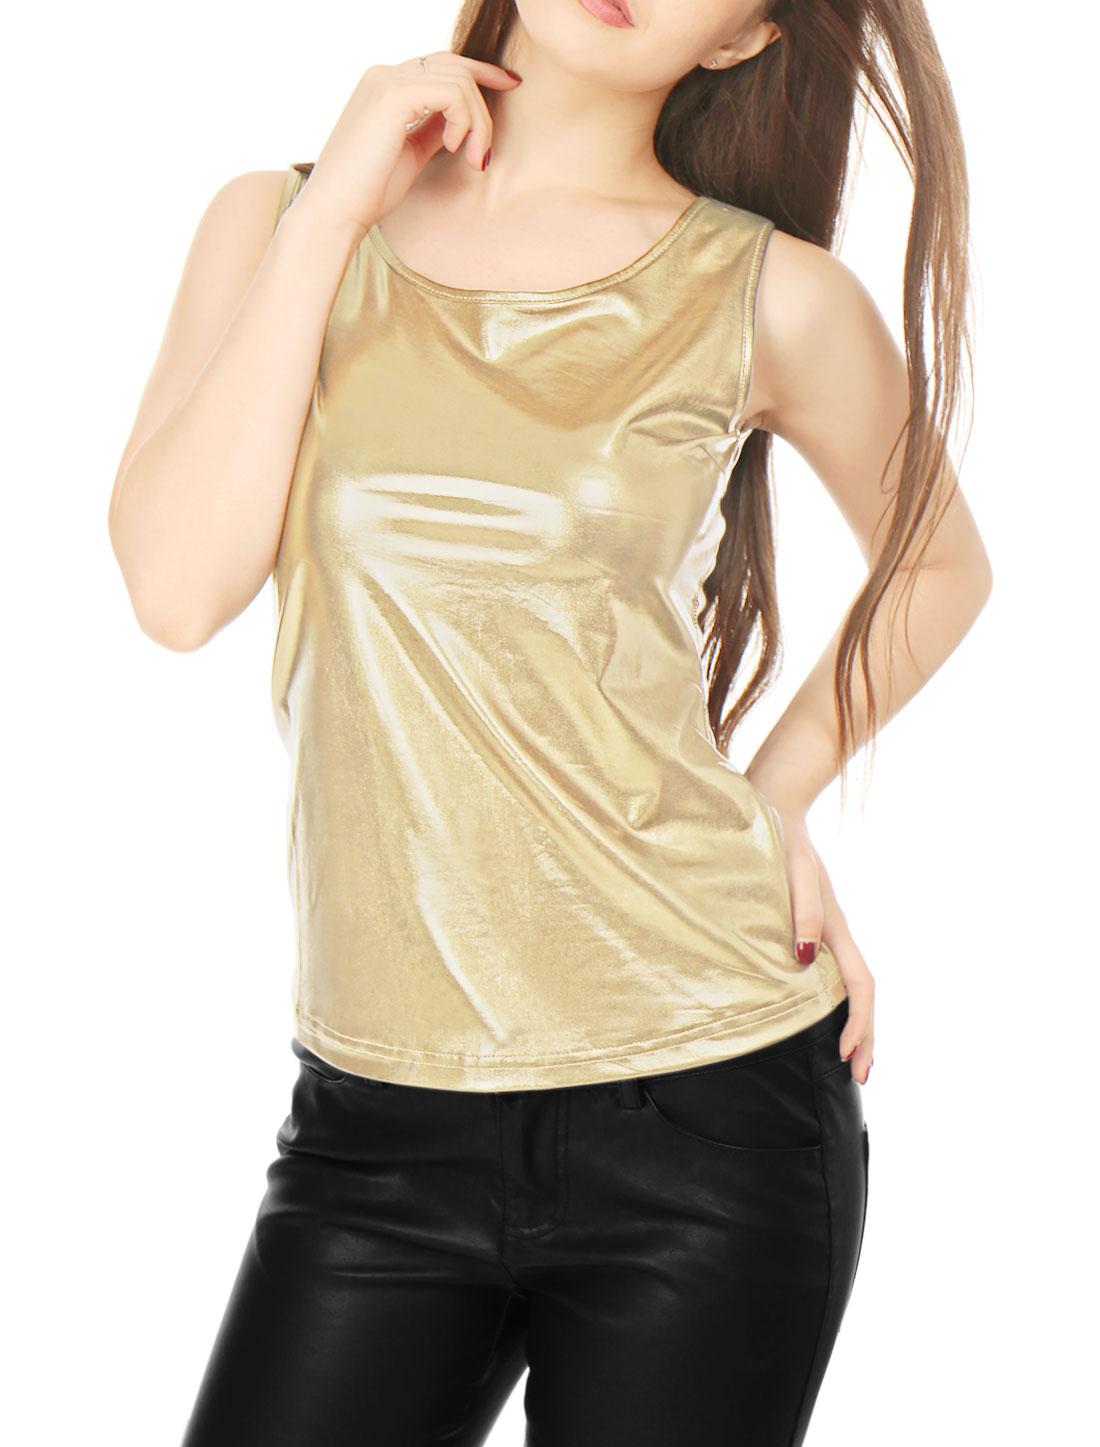 Lady Sleeveless U Neck Fashion Metallic Tank Top Gold L